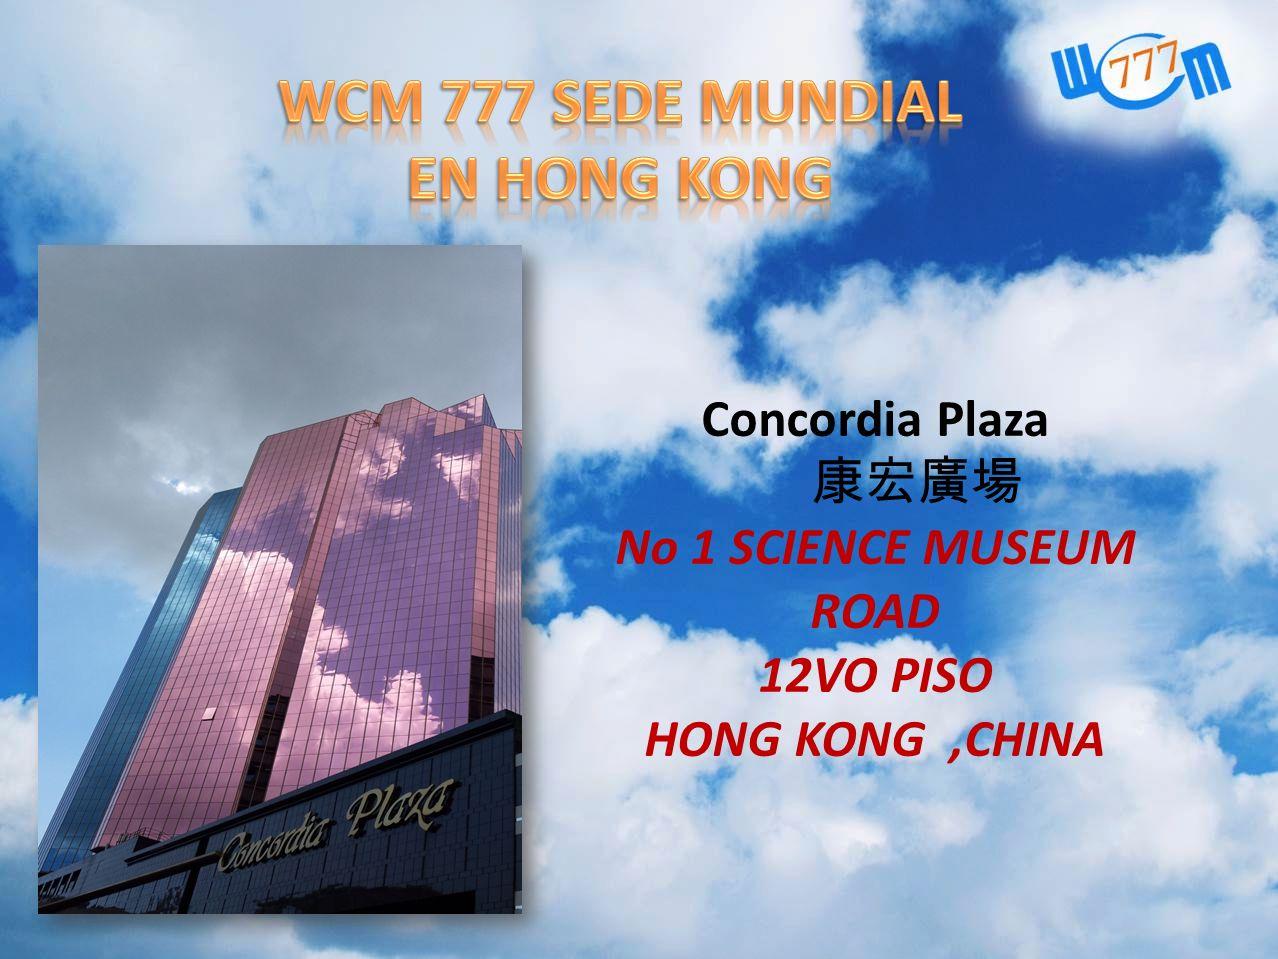 Concordia Plaza No 1 SCIENCE MUSEUM ROAD 12VO PISO HONG KONG,CHINA